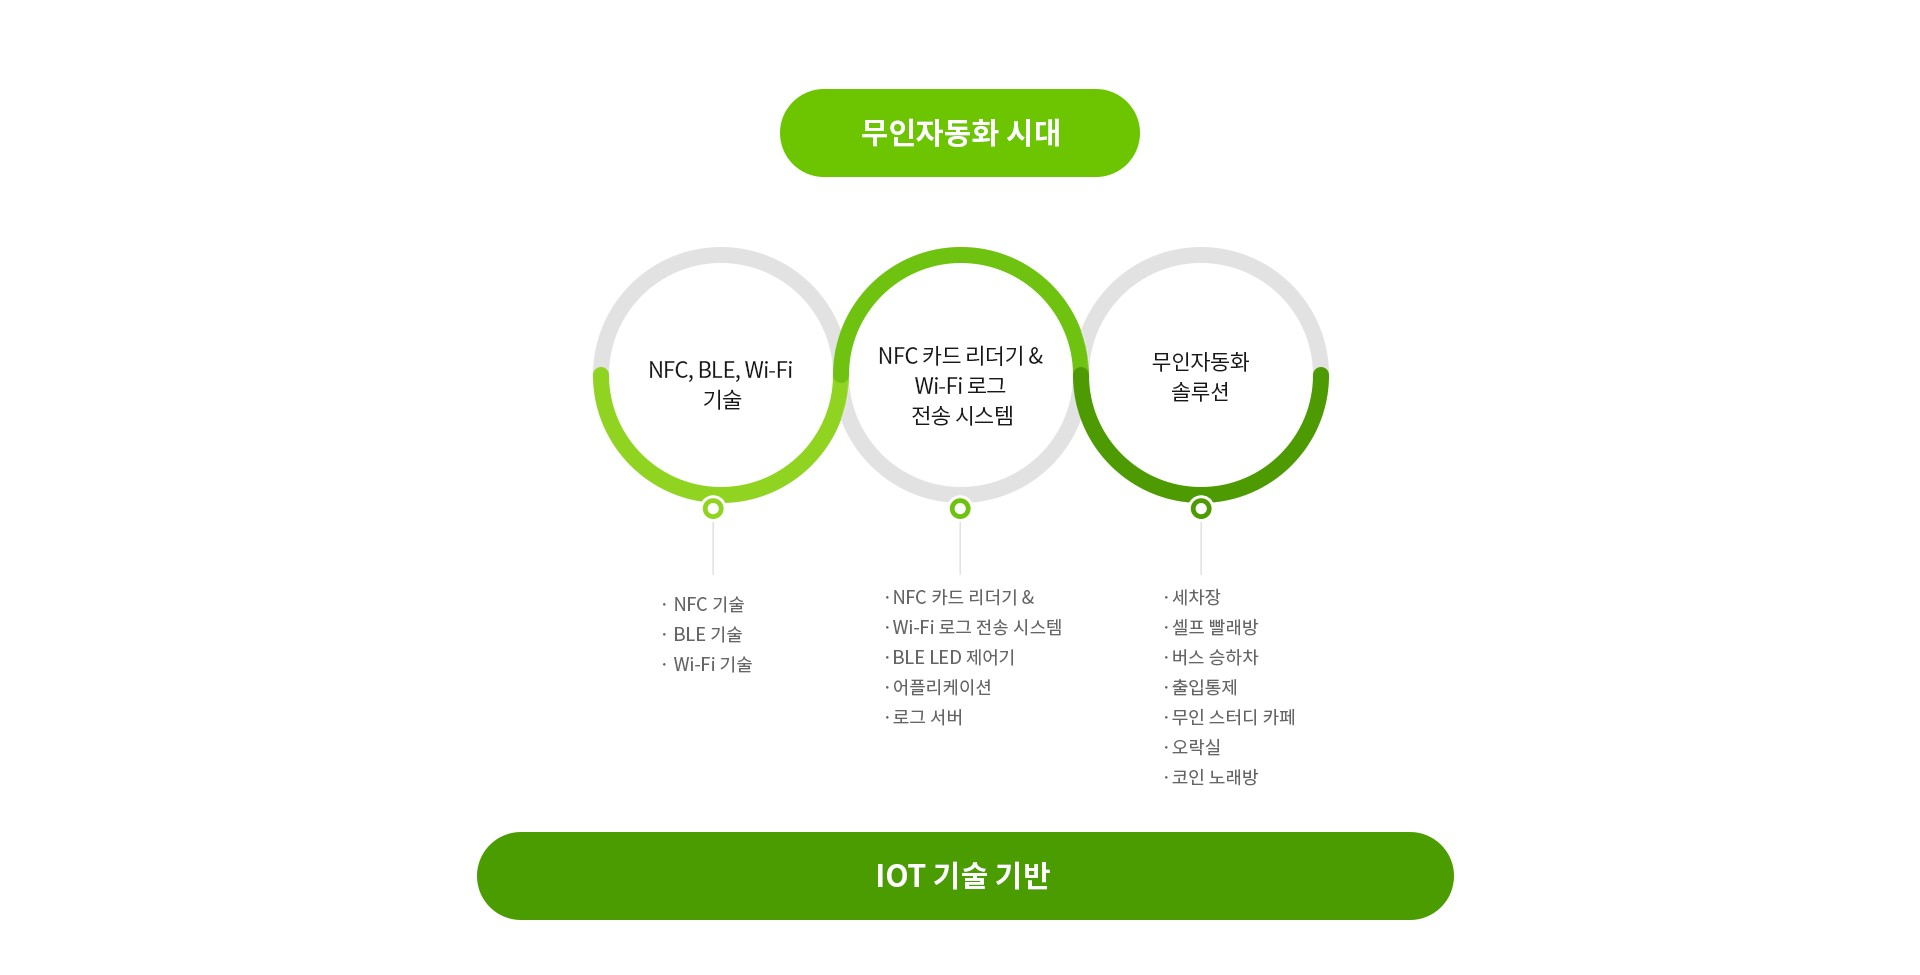 http://www.ttcnc.co.kr/wp-content/uploads/2018/07/ttcnc_sub_vision.jpg